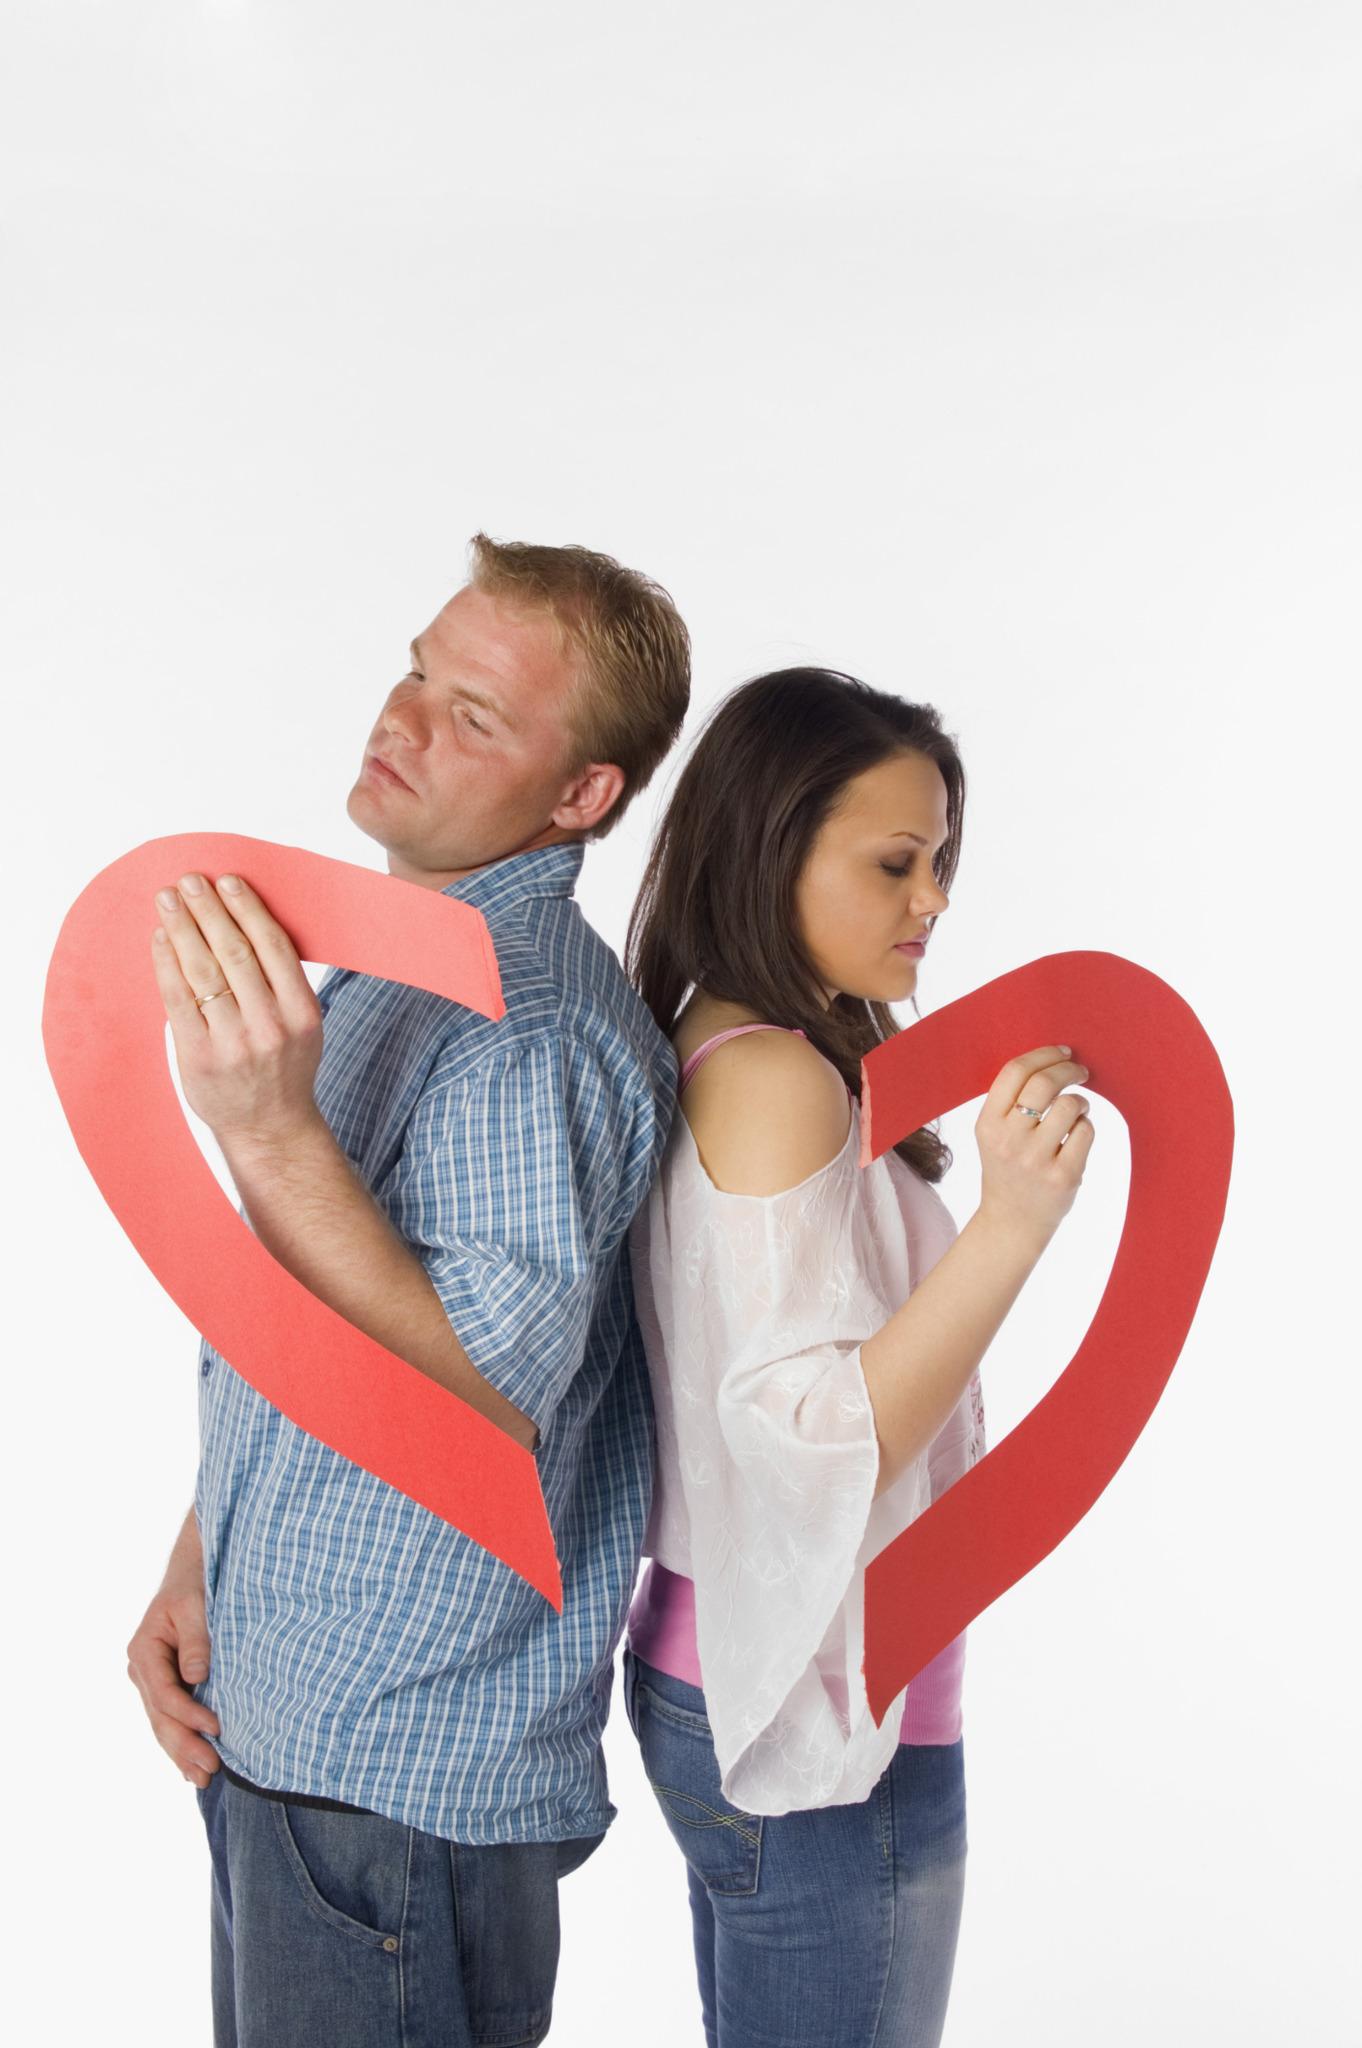 Sankt nikolai im sausal datingseite - Sankt gallenkirch single flirt